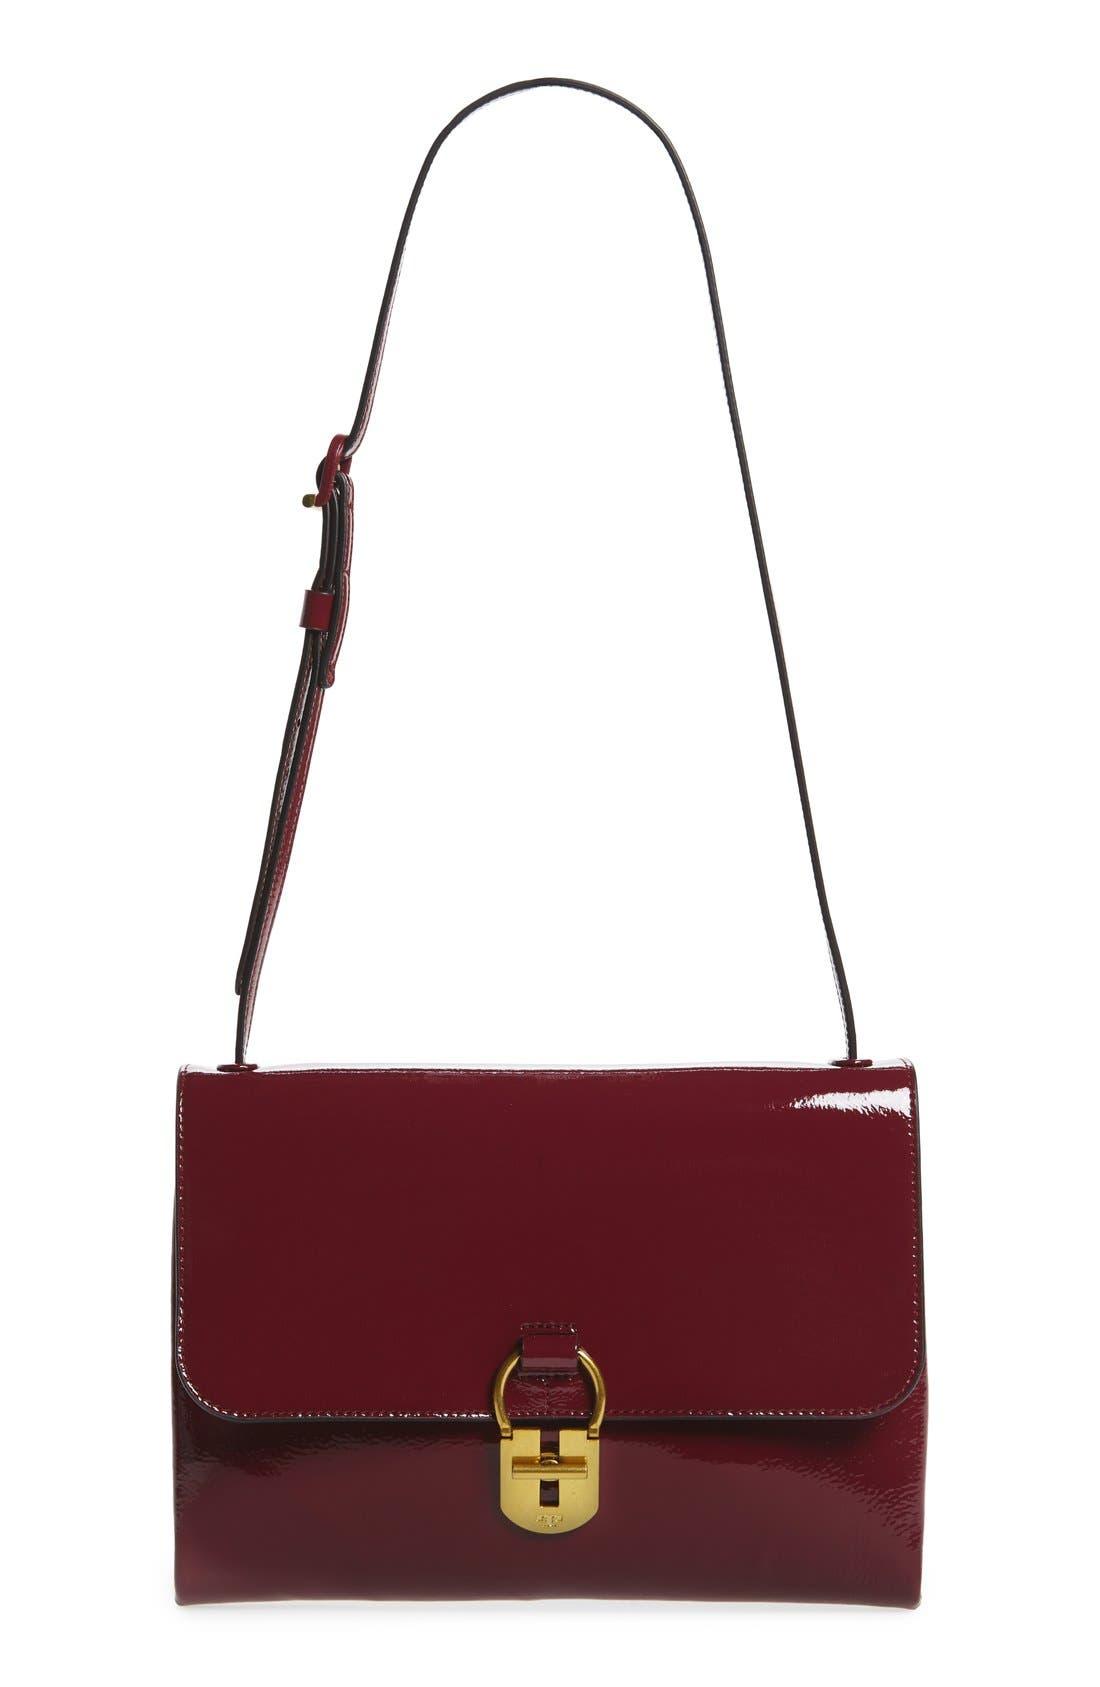 Patent Leather Convertible Shoulder Bag,                             Main thumbnail 1, color,                             606